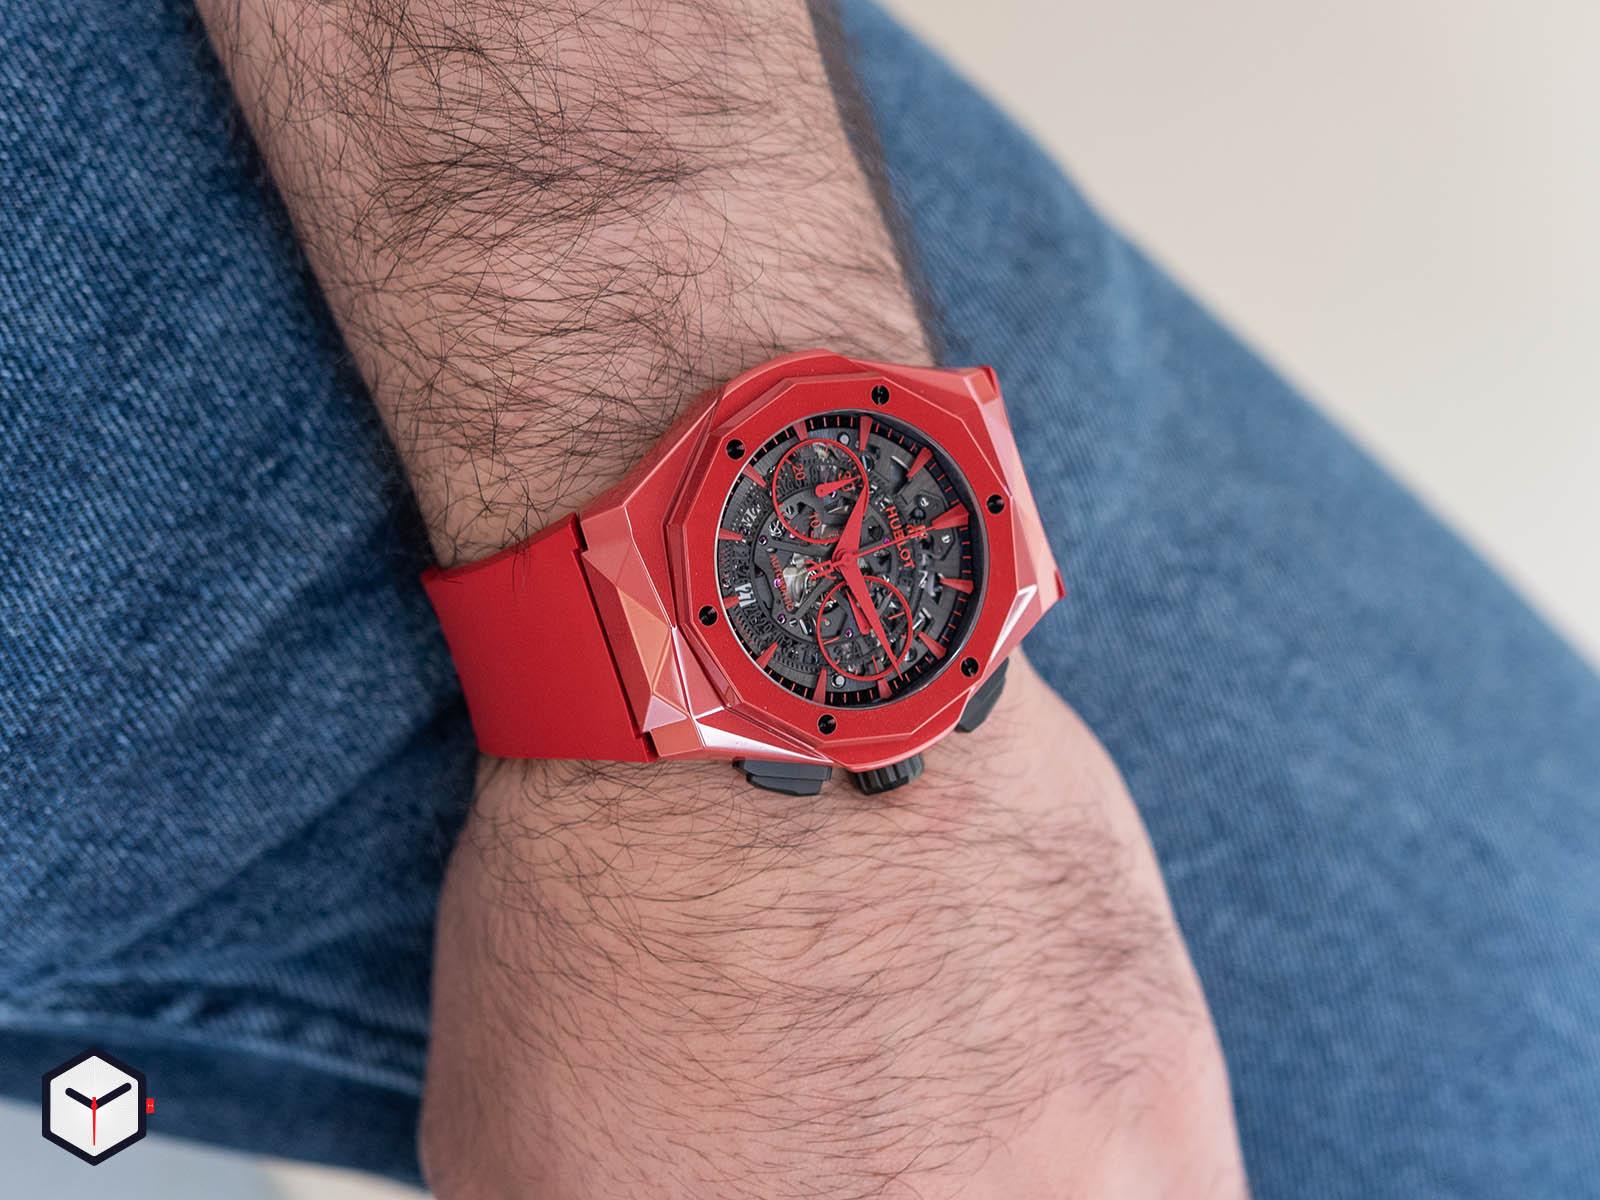 525-cf-0130-rx-orl19-hublot-classic-fusion-chronograph-orlinski-red-ceramic-8.jpg